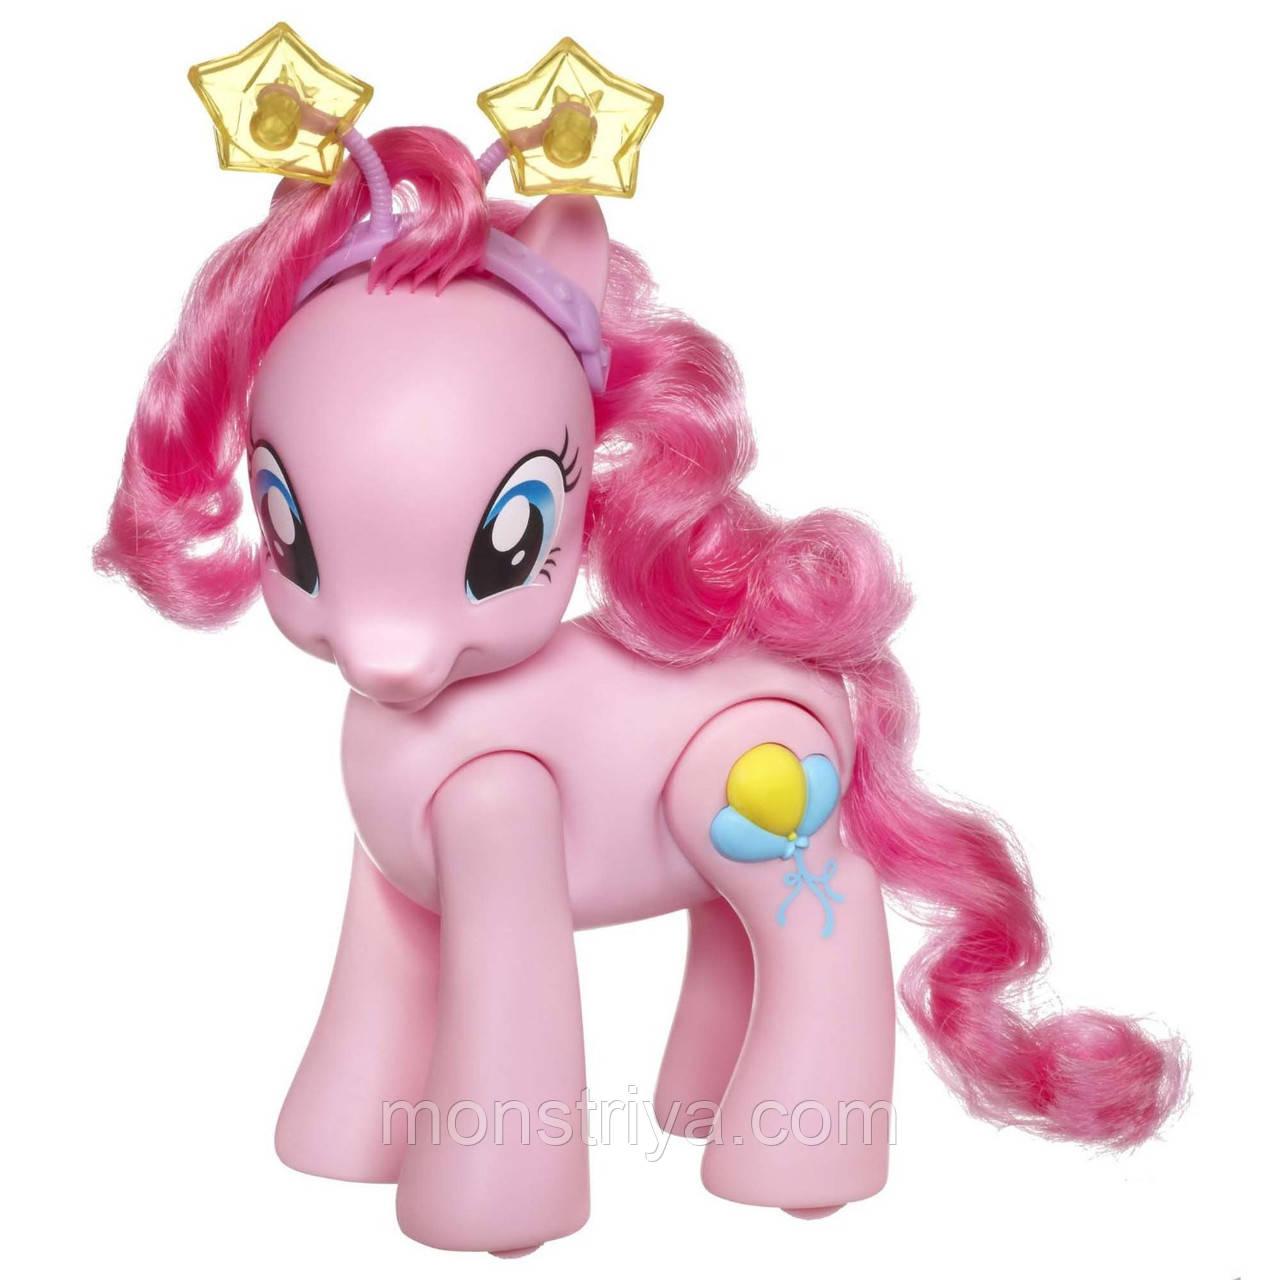 Пони Пинки Пай (My Little Pony Walking Talking Pinkie Pie Pony).